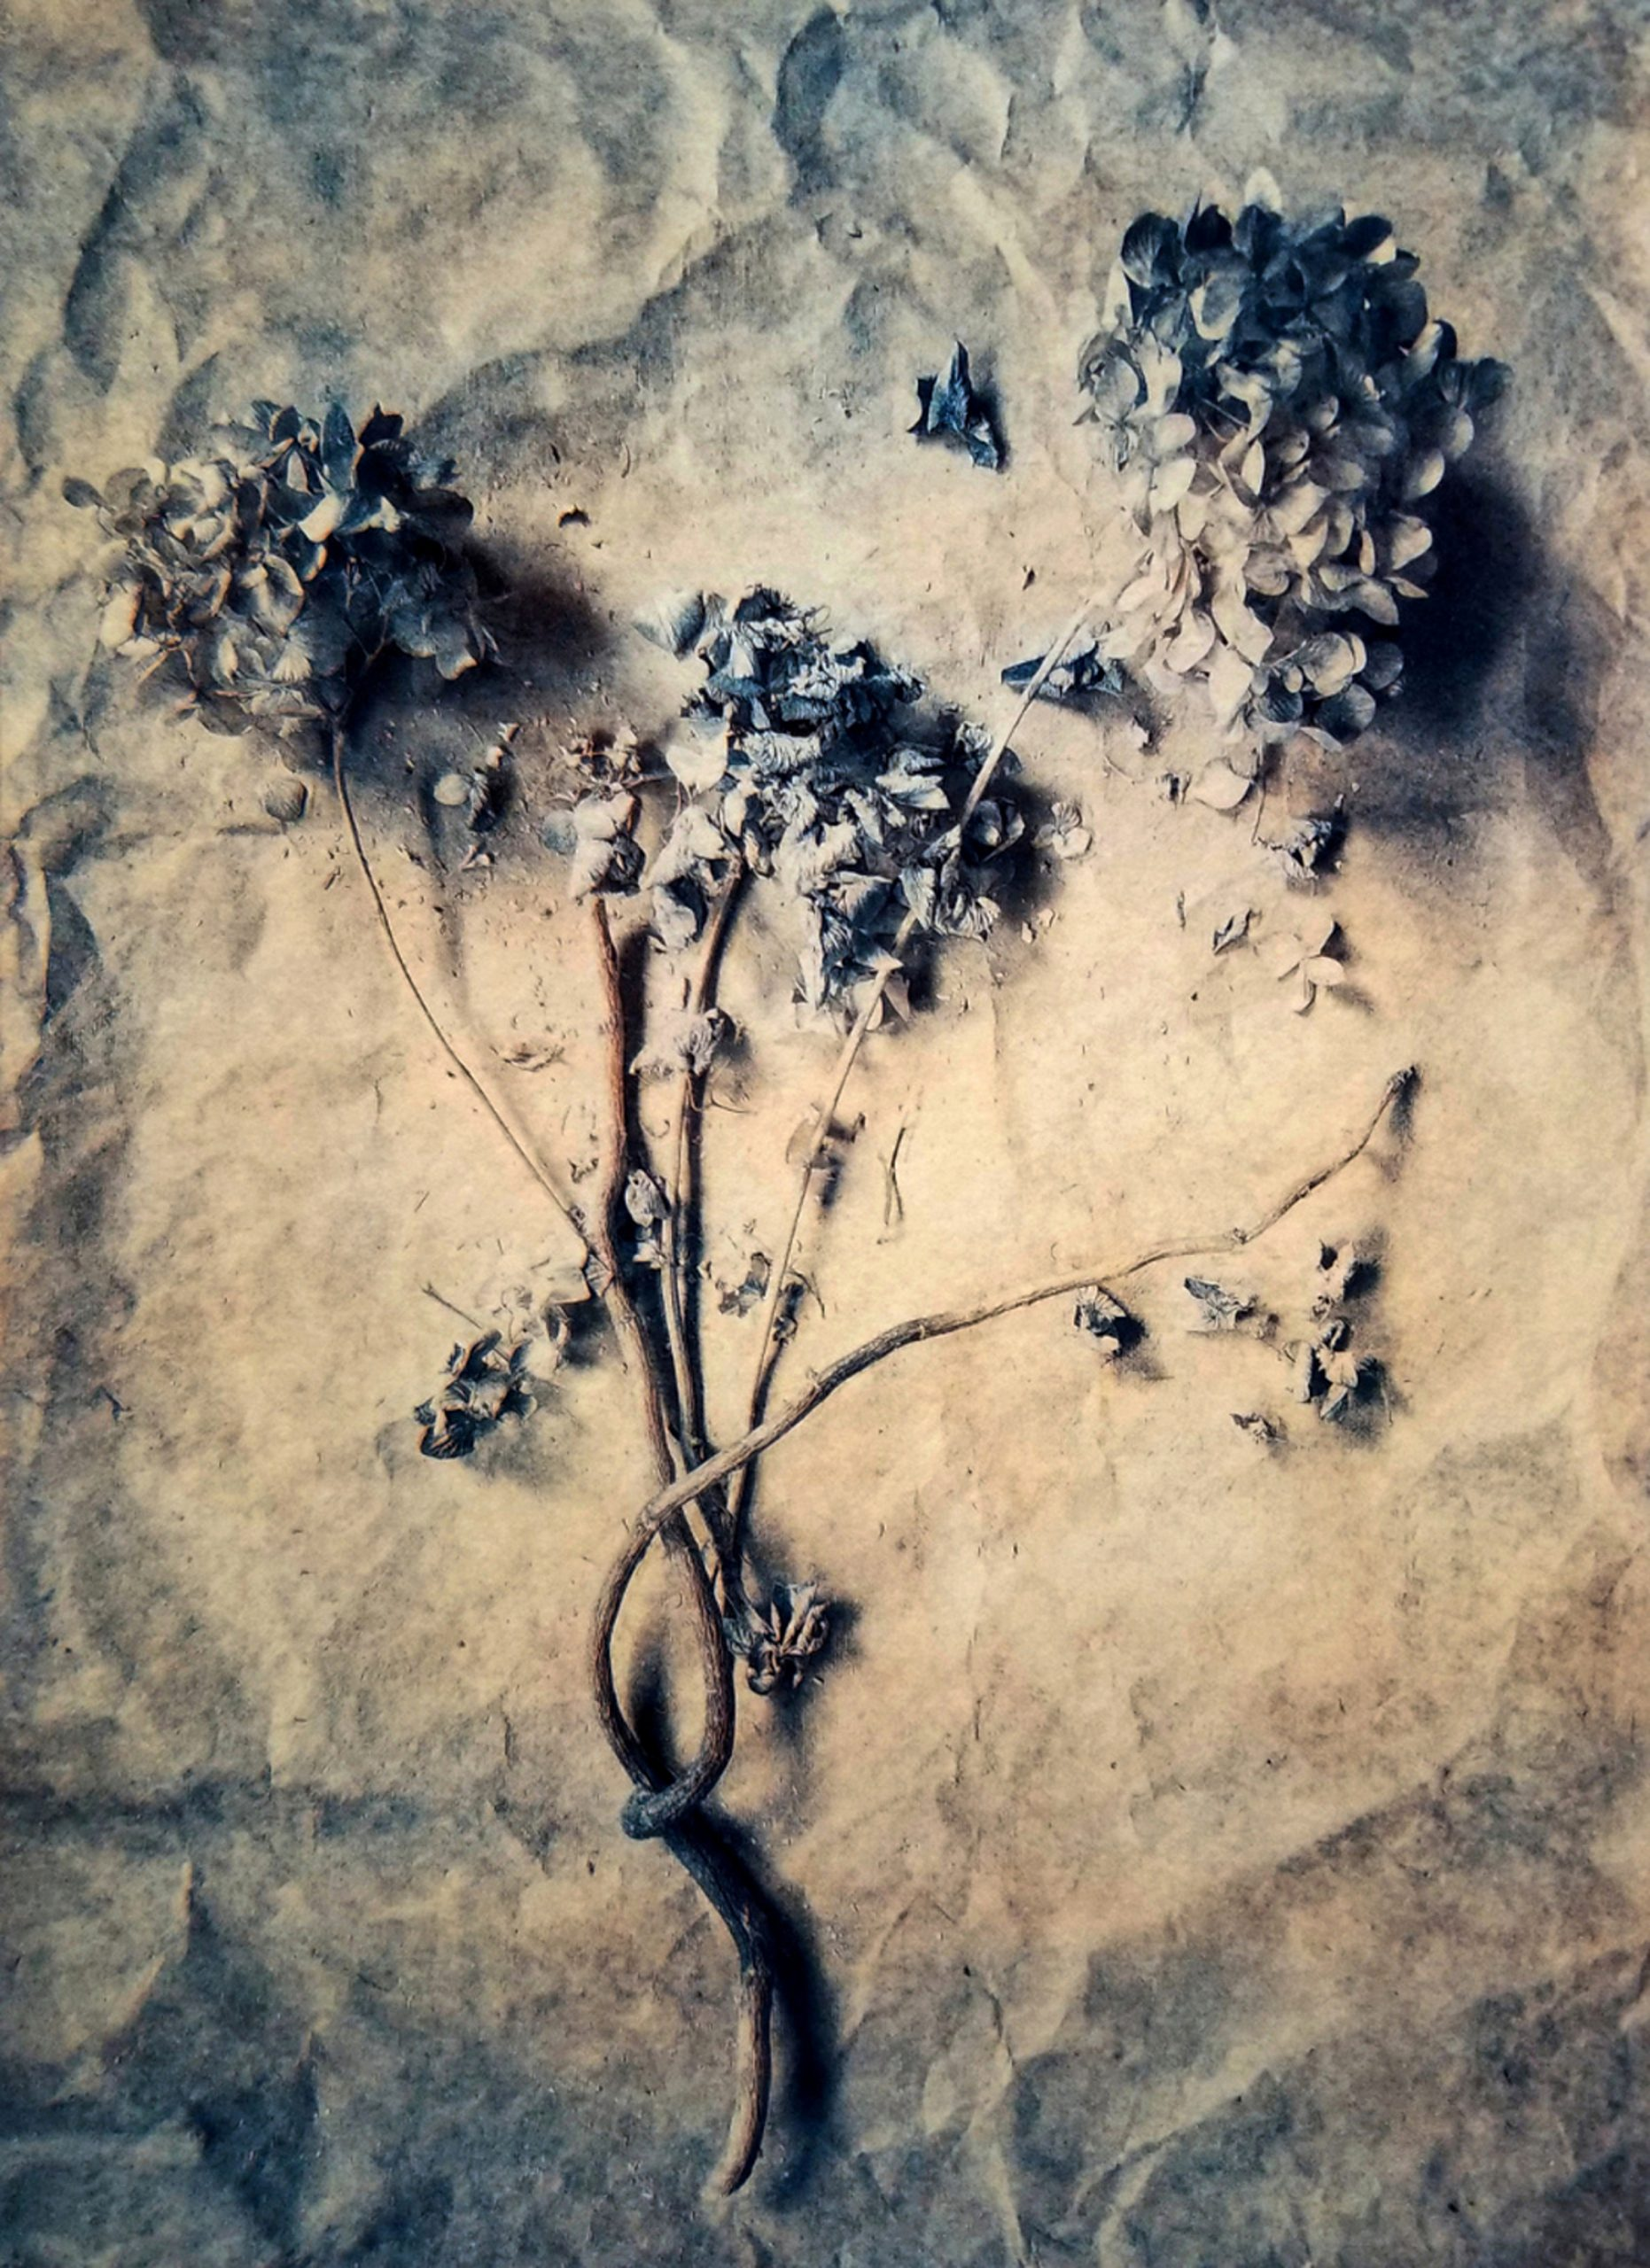 Diana H. Bloomfield, Hydrangea, 2018. Courtesy of the artist.